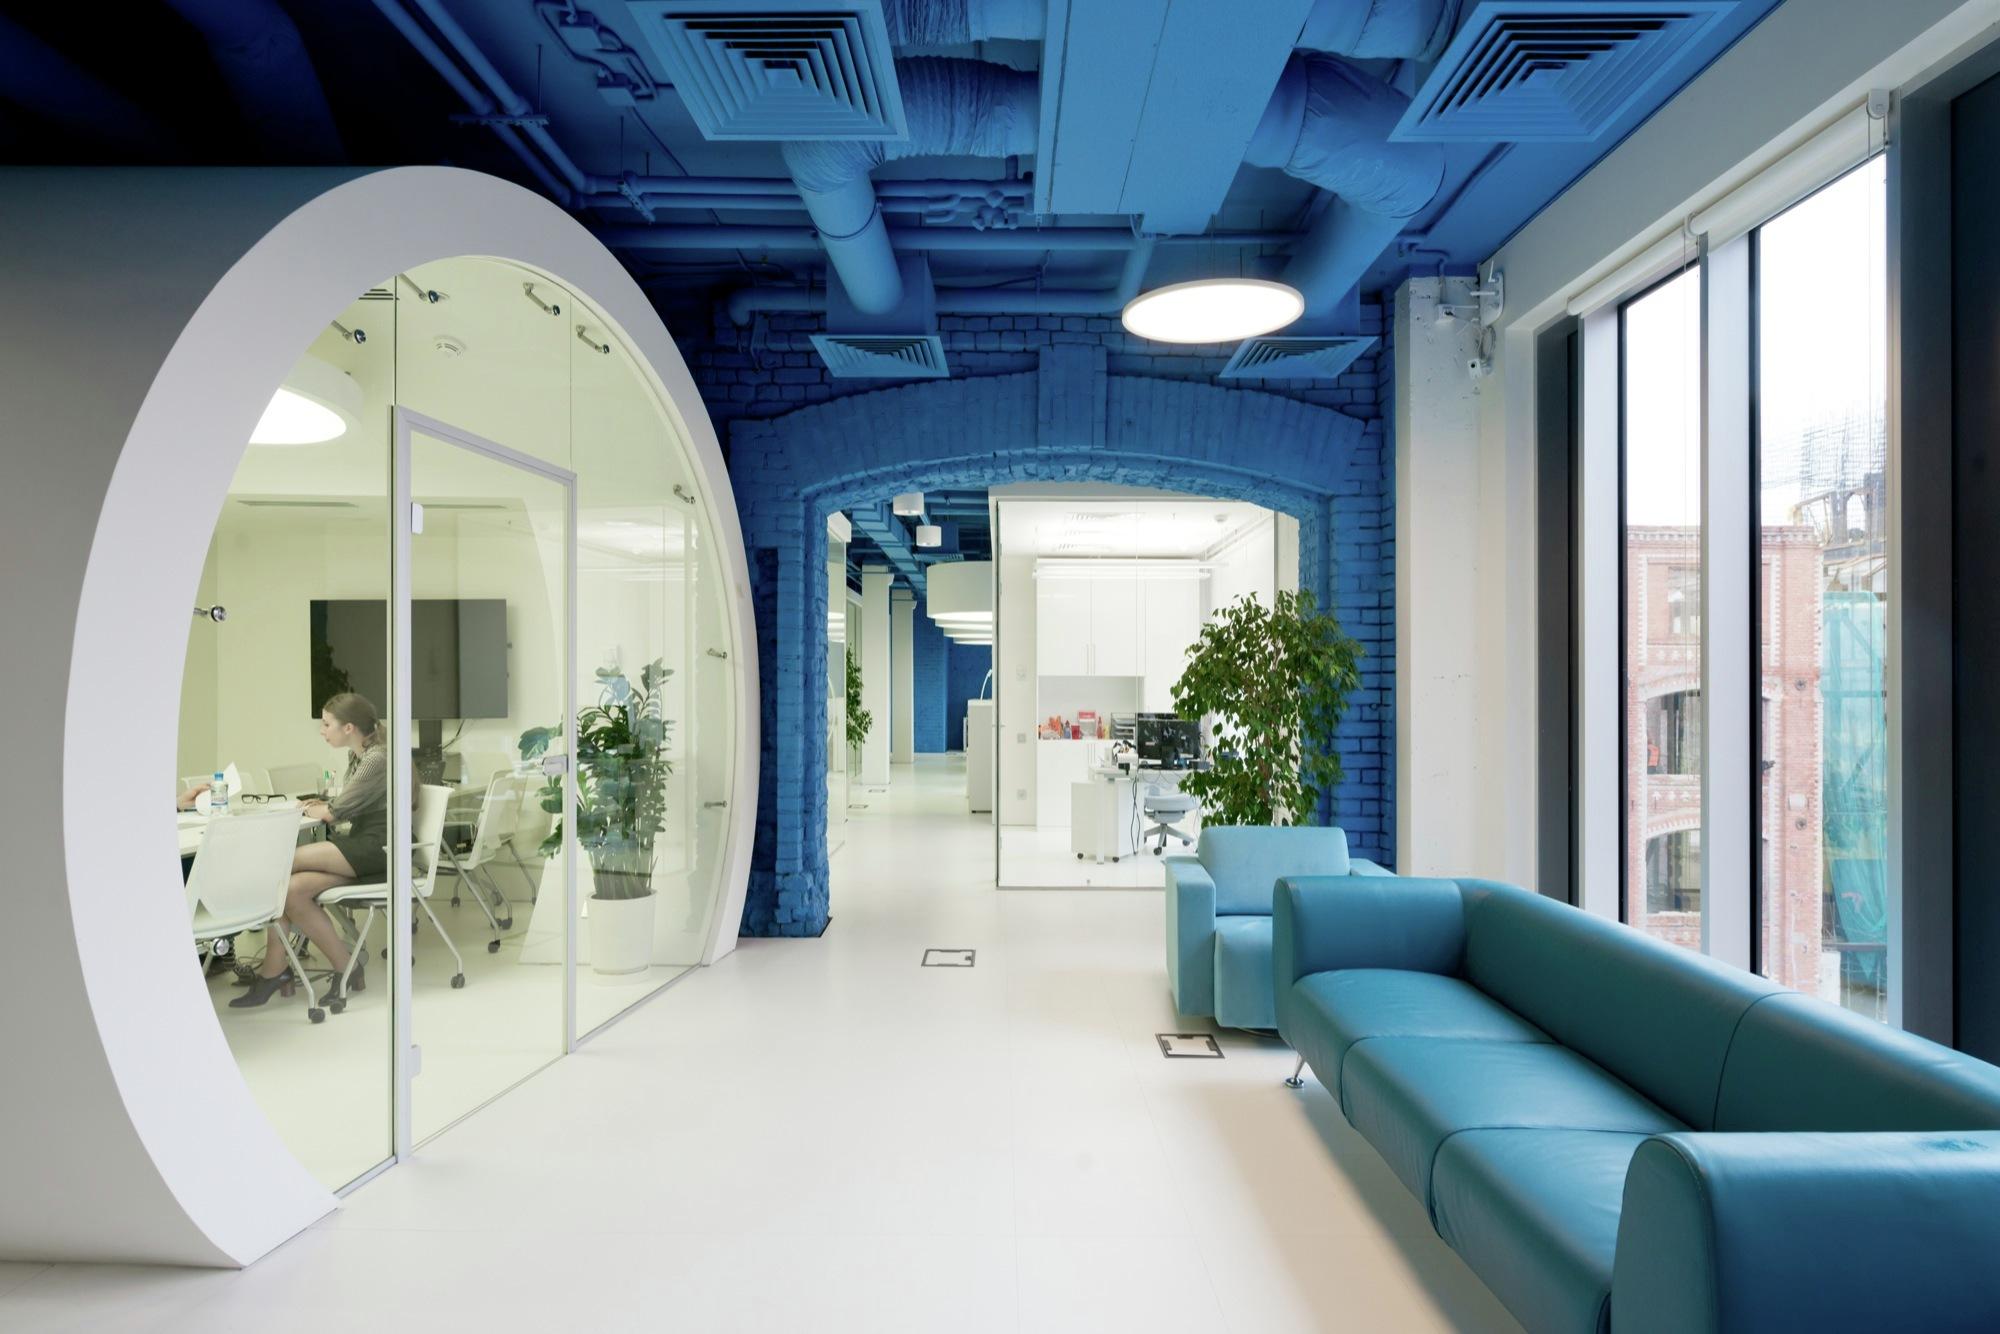 ad agency office design. Ad Agency Office Design